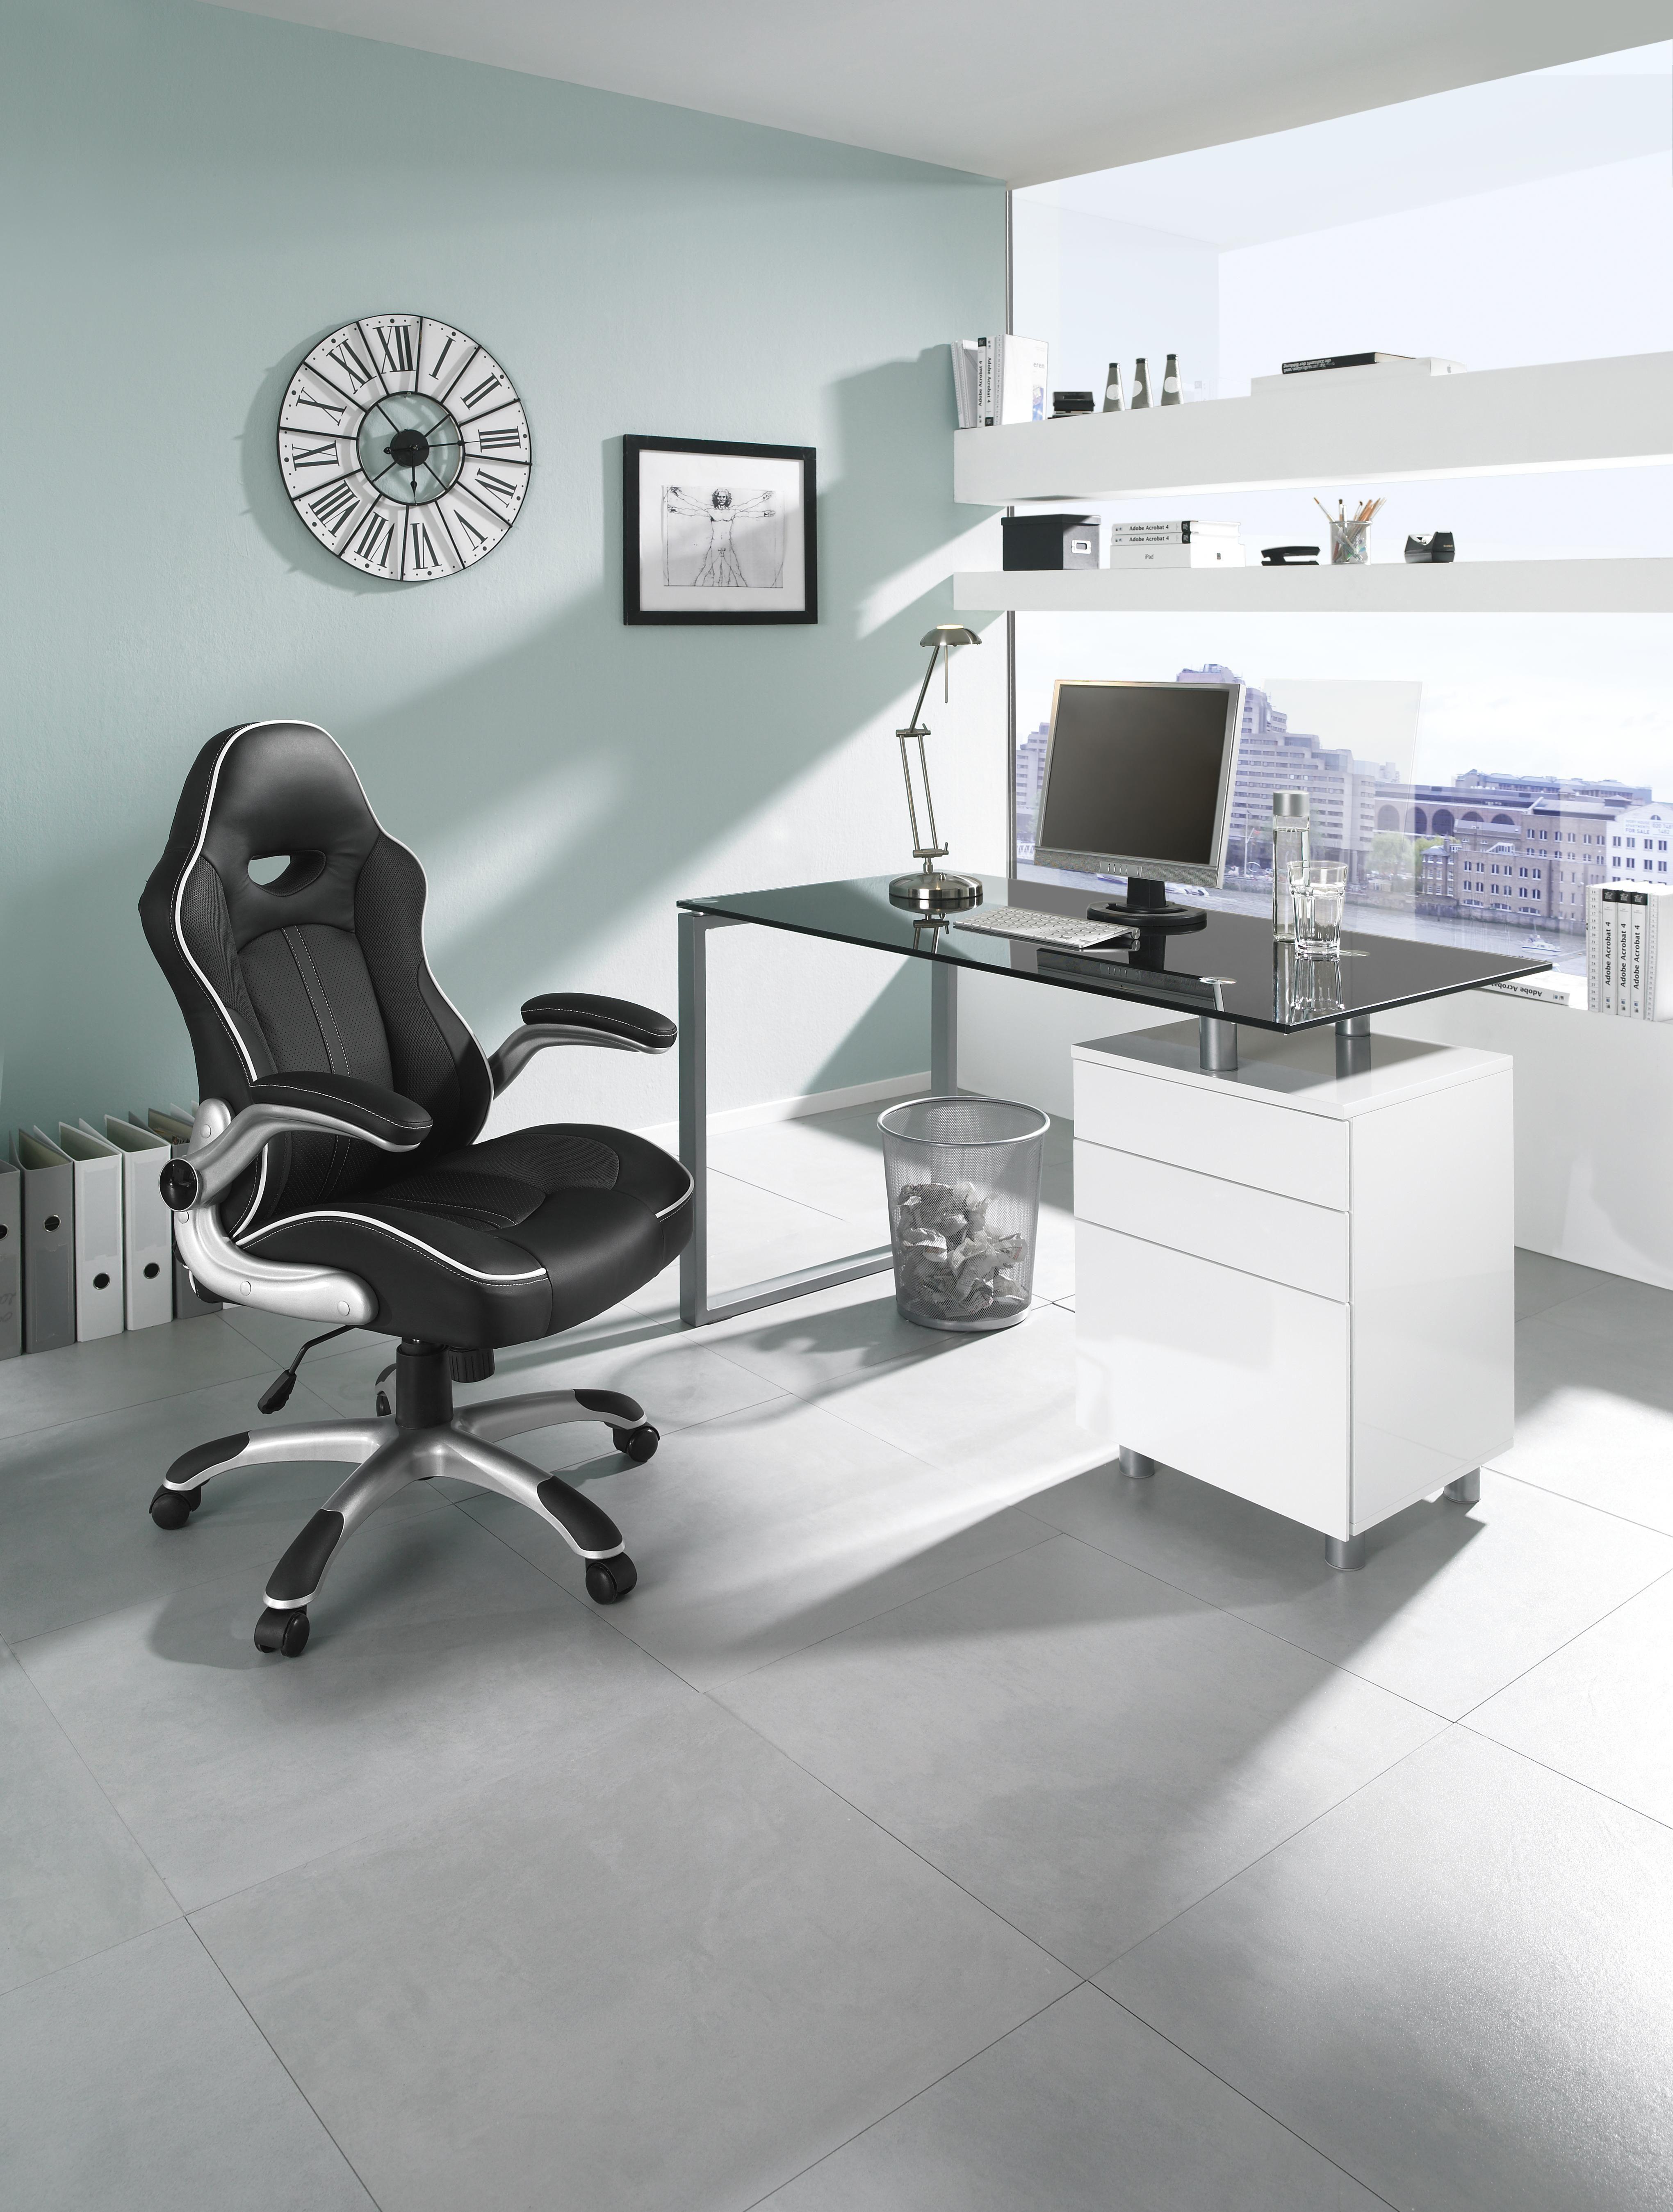 Udobna Stolica Ce Vam Olaksati Svaki Radni Dan Office Chair Home Office Comfort Back Support Desk Modern Desk Chair Vintage Office Chair